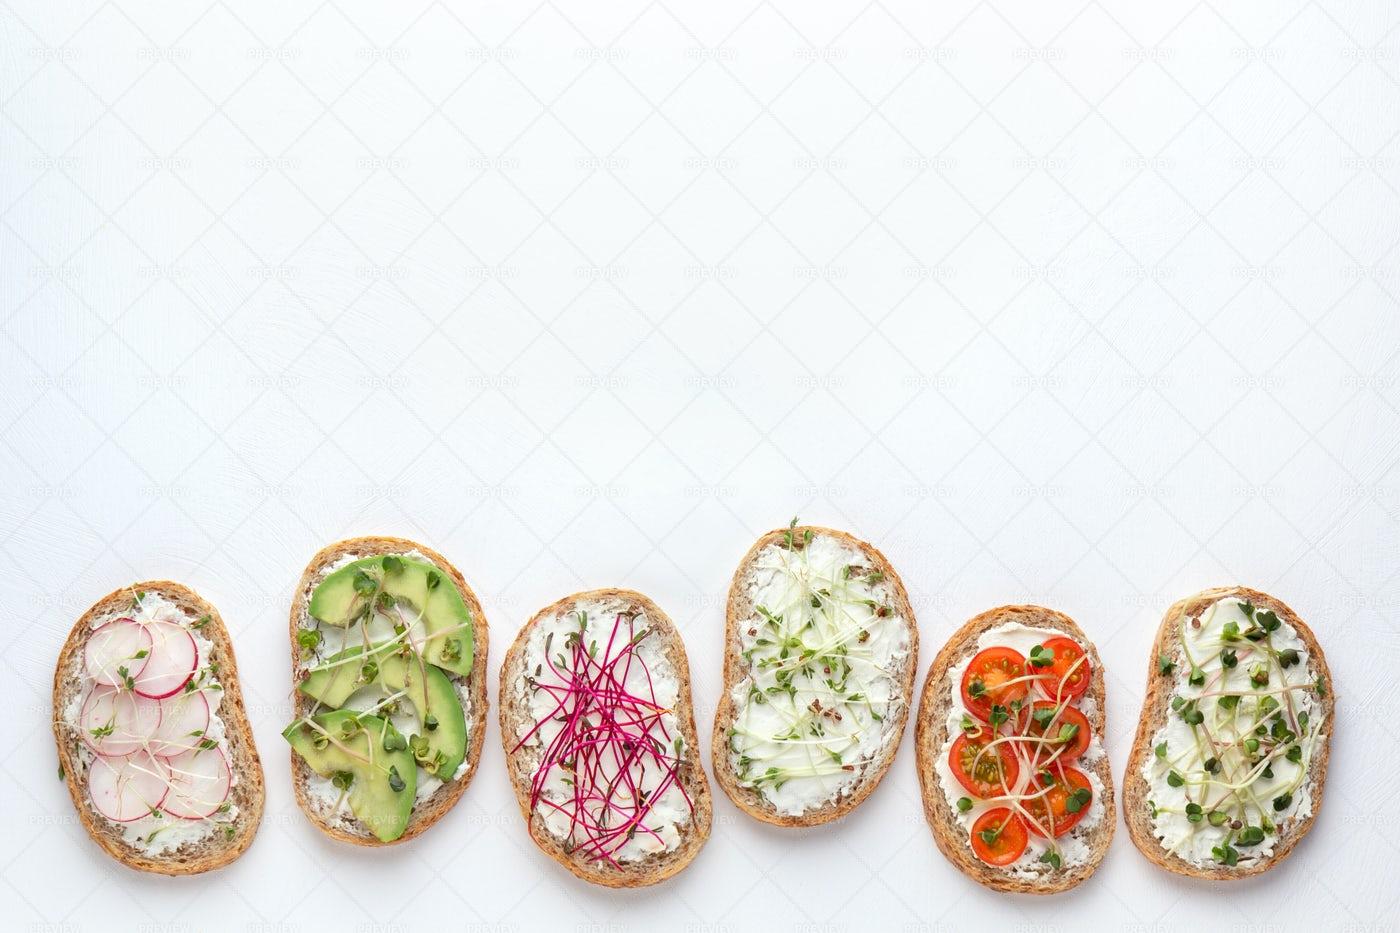 Healthy Bread Spreads: Stock Photos